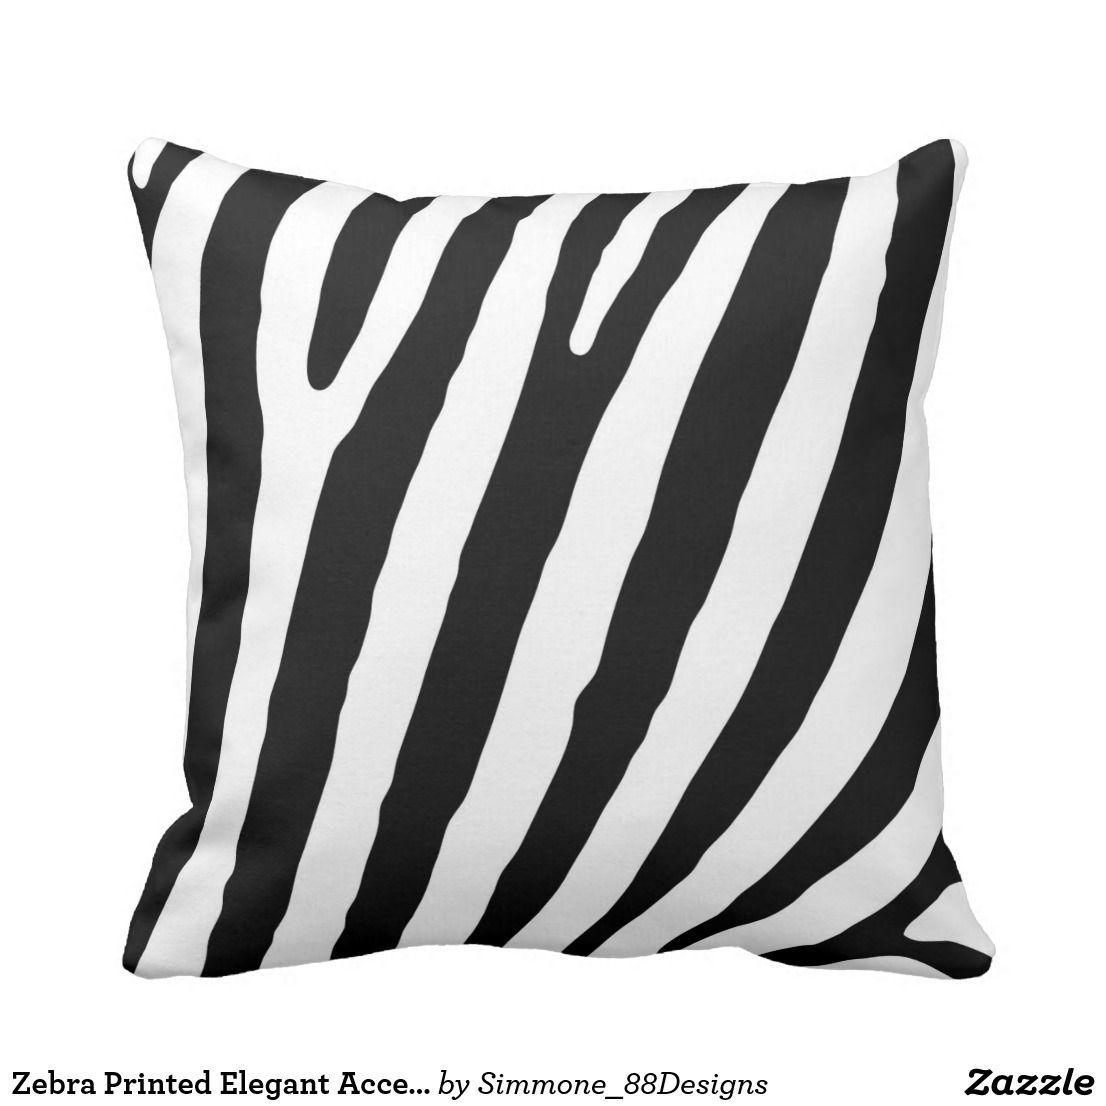 Zebra printed elegant accent couch cushion zebra print elegant